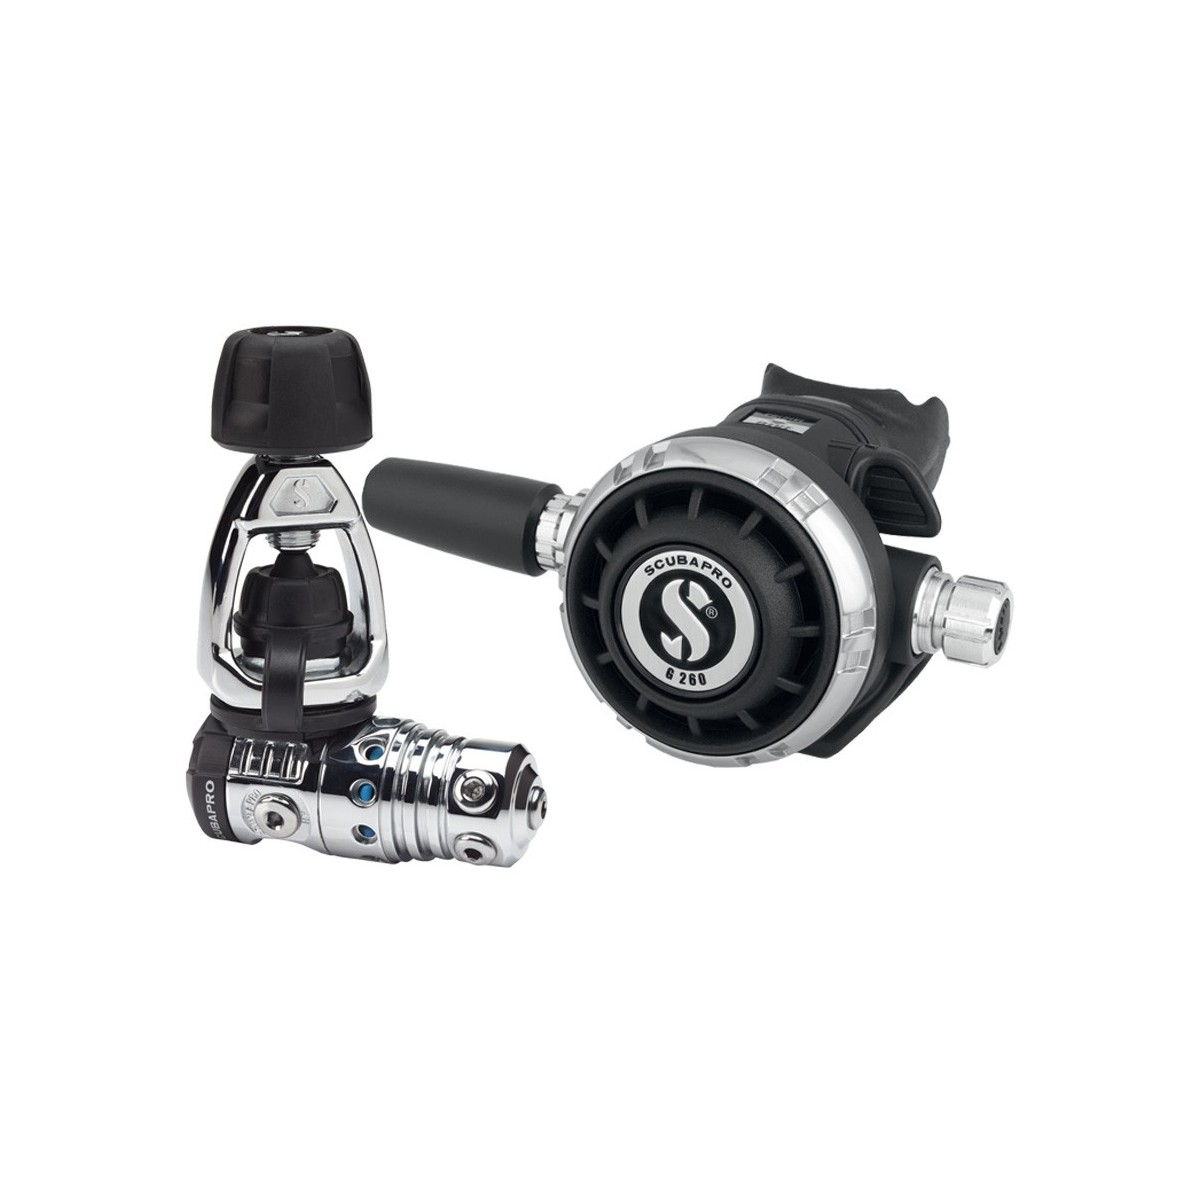 Scubapro MK25 EVO/G260 Black Tech Regulator - Yoke